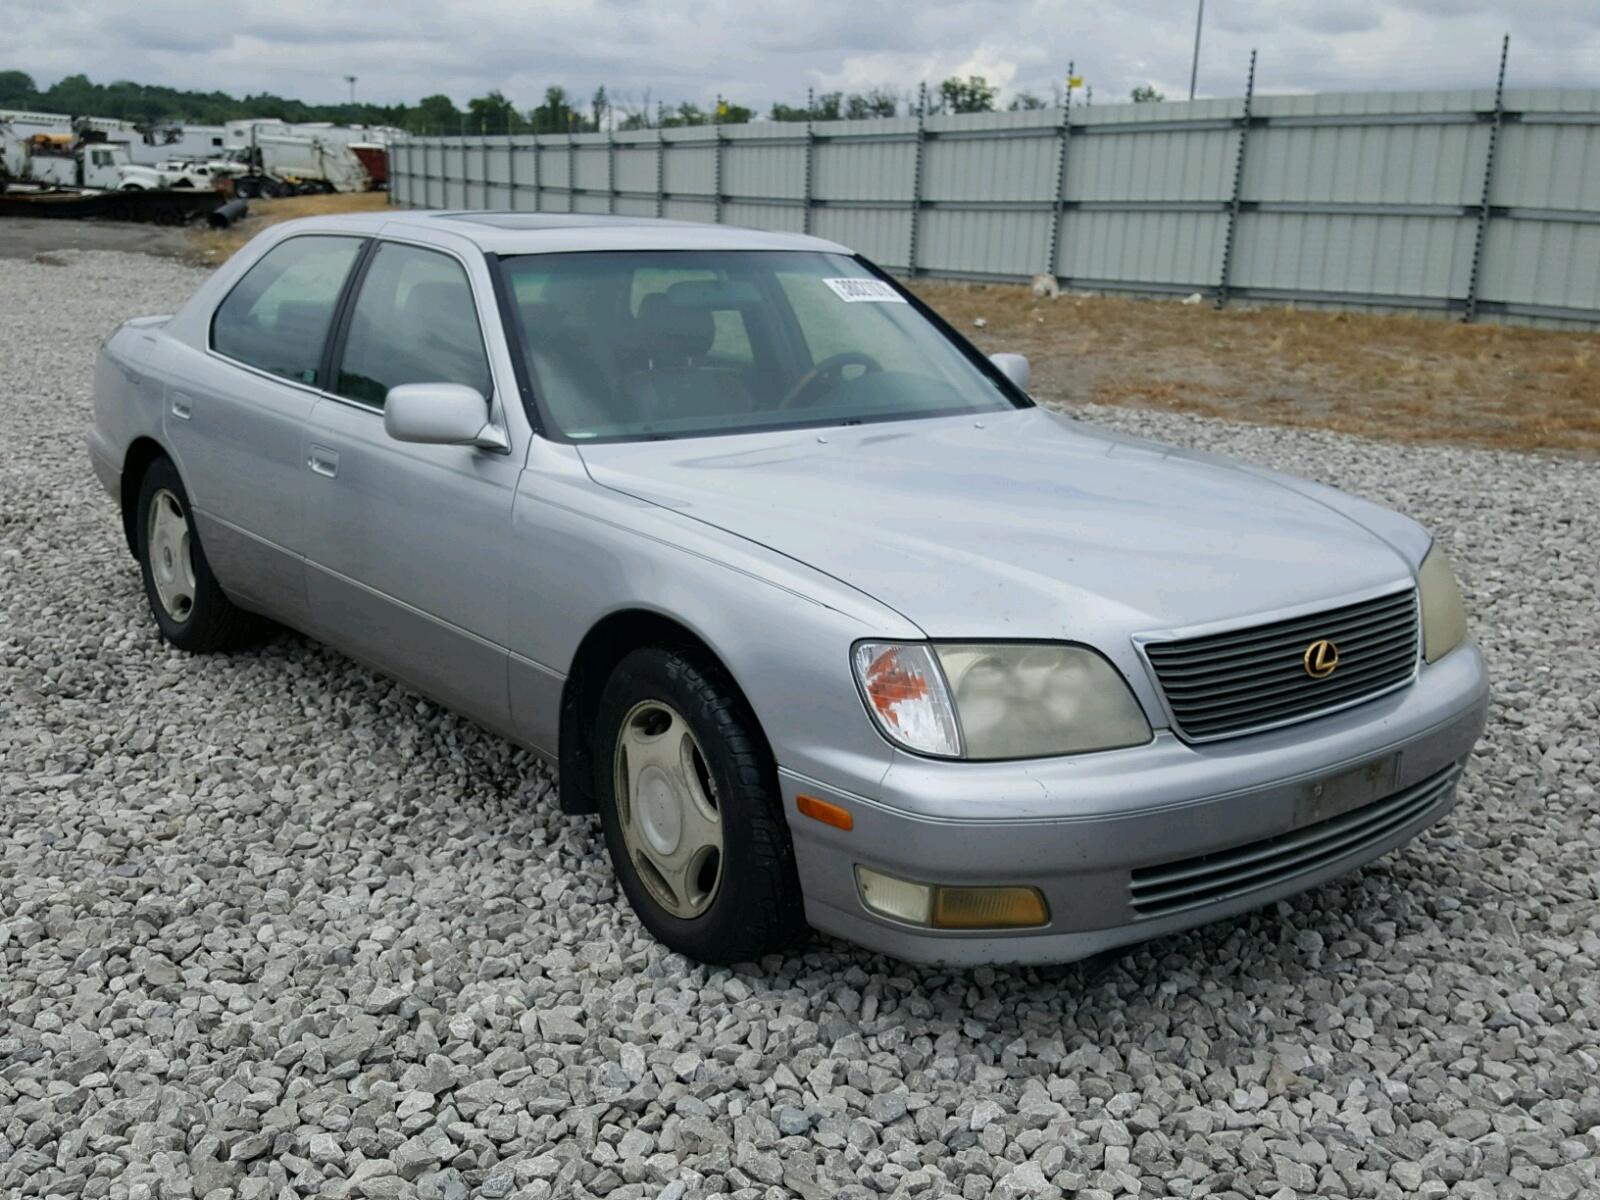 Salvage 1999 Lexus LS 400 for sale